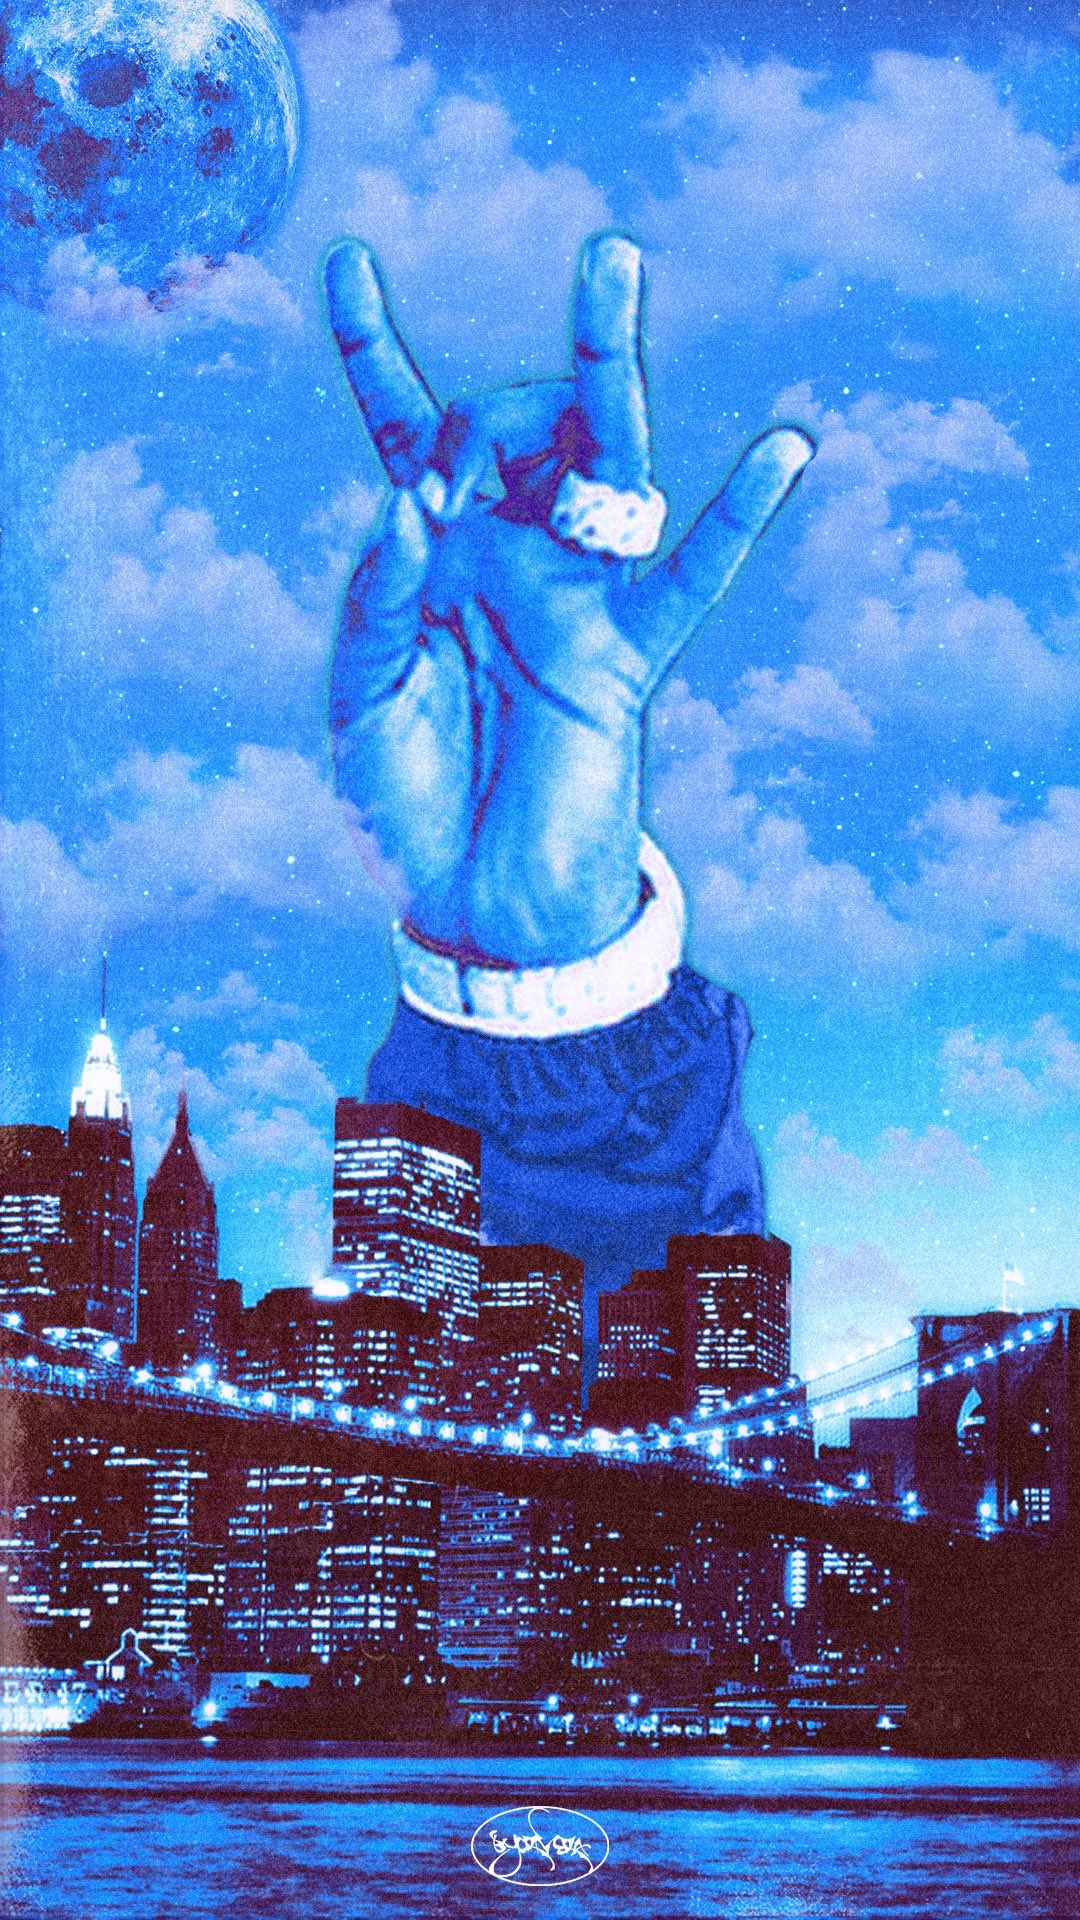 1080x1920 C. RIVERA - WOOO CITY, LONG LIVE POP SMOKE hình nền